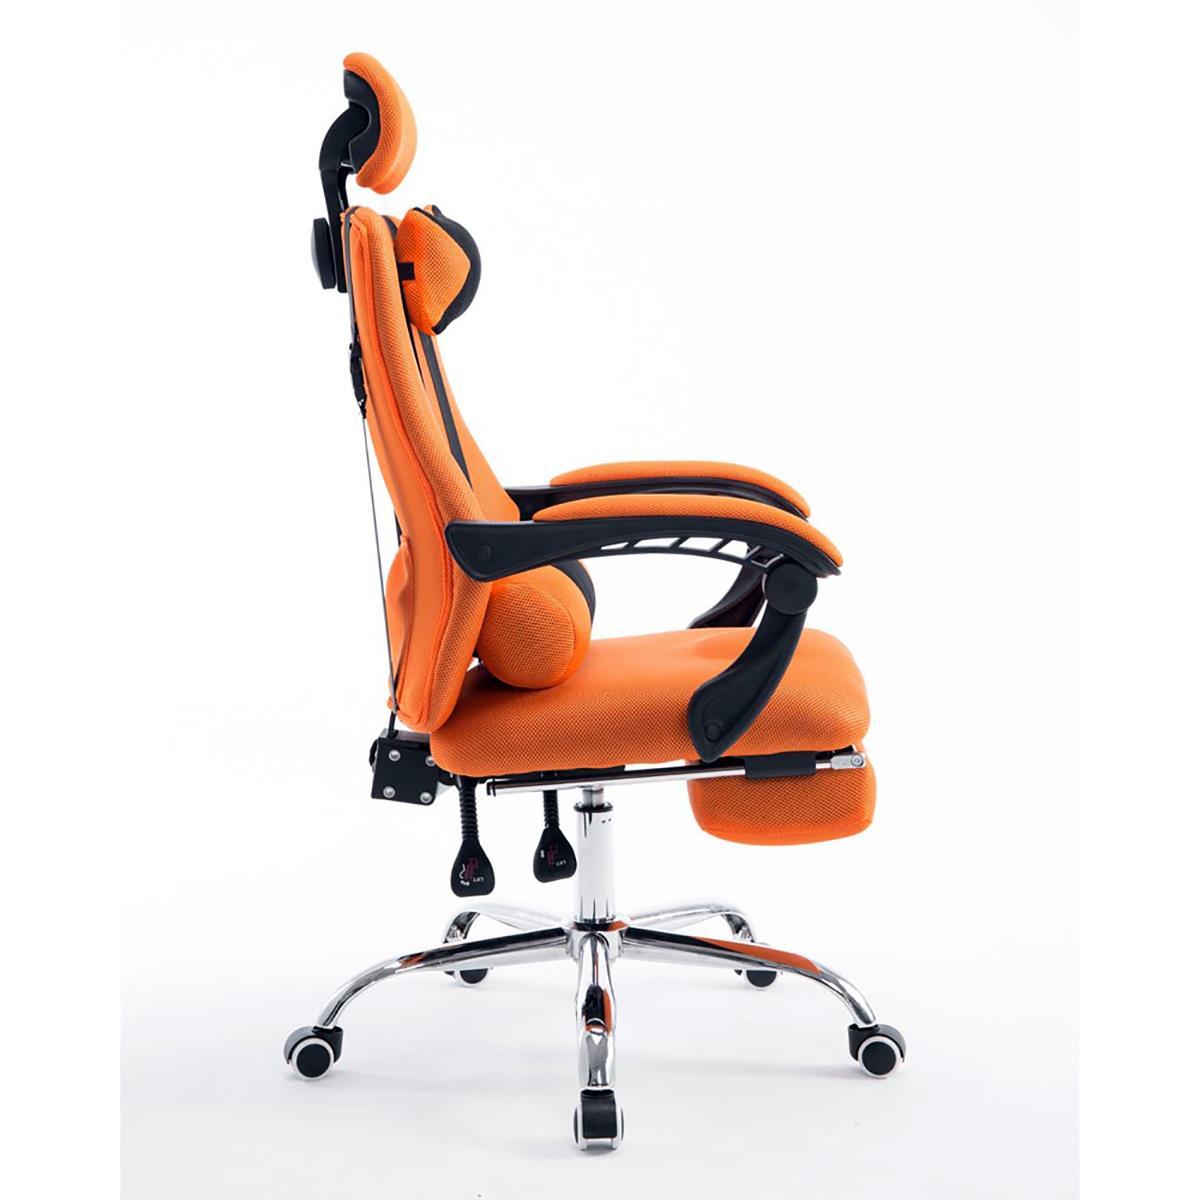 Silla de oficina antares reclinable en varias posiciones - Reposapies oficina carrefour ...